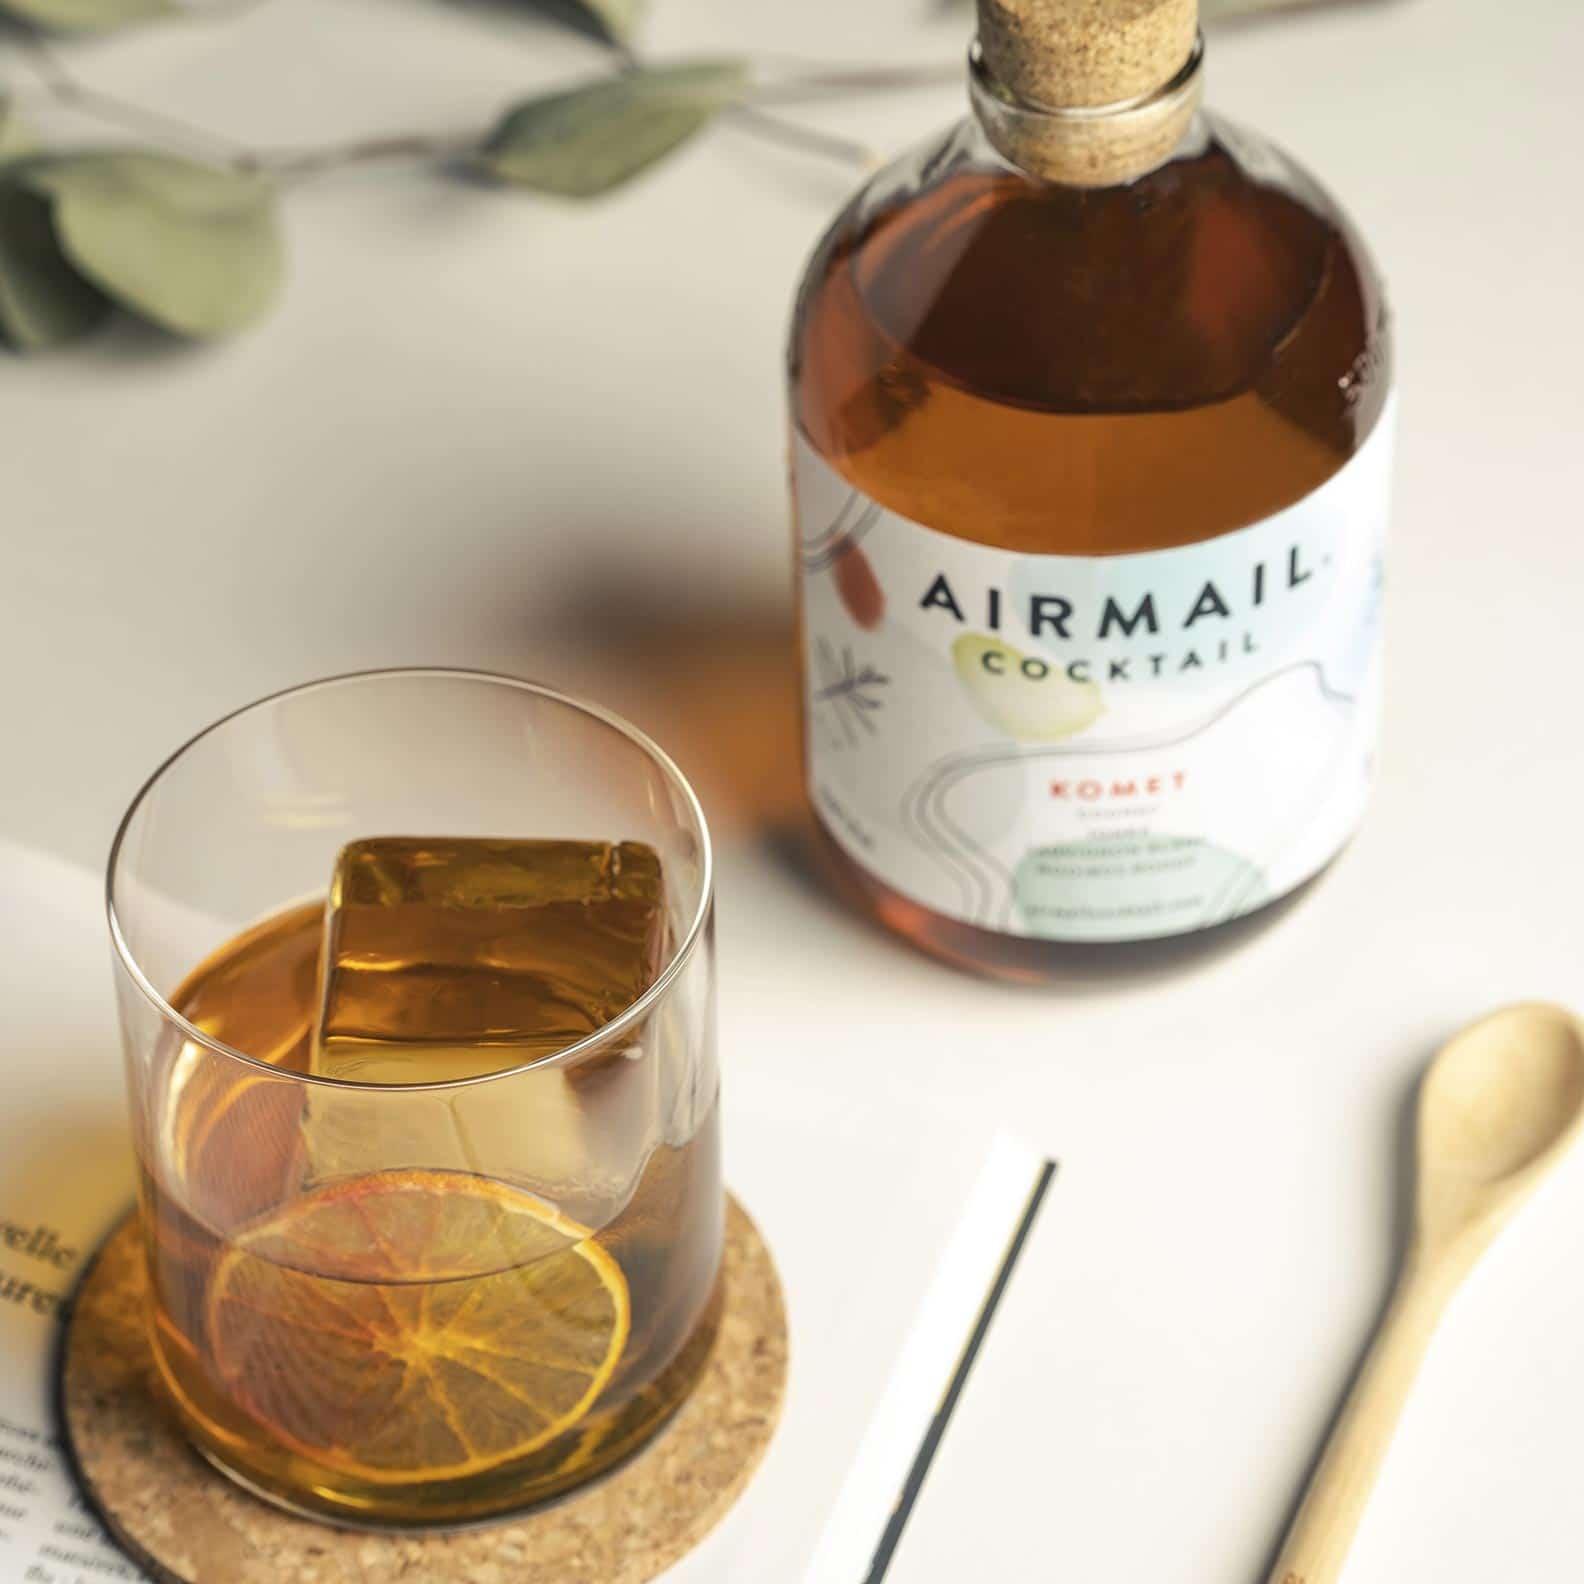 airmail cocktail komet inspiration